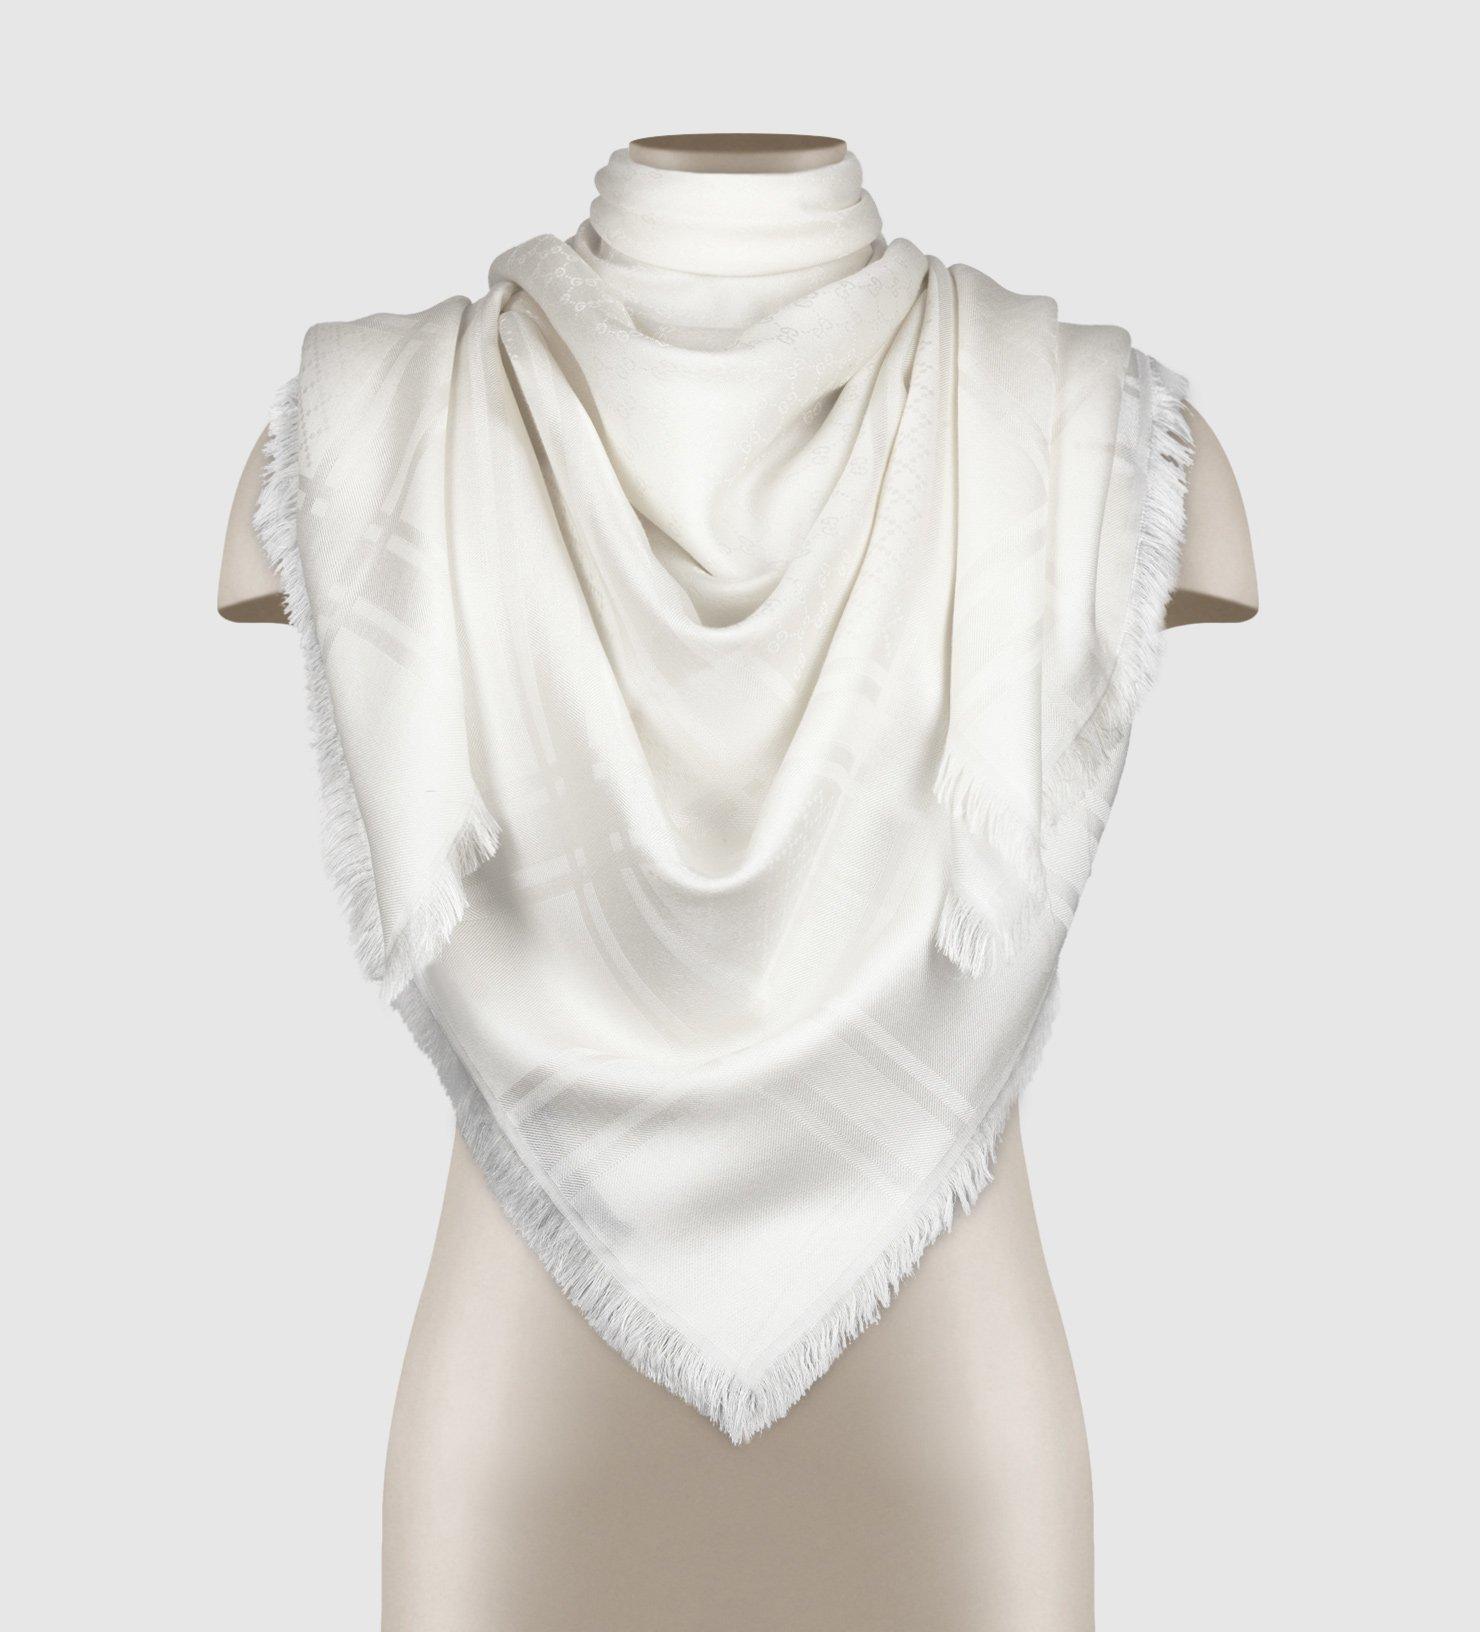 Gucci logo silk scarf - White Gucci A0xbpk7